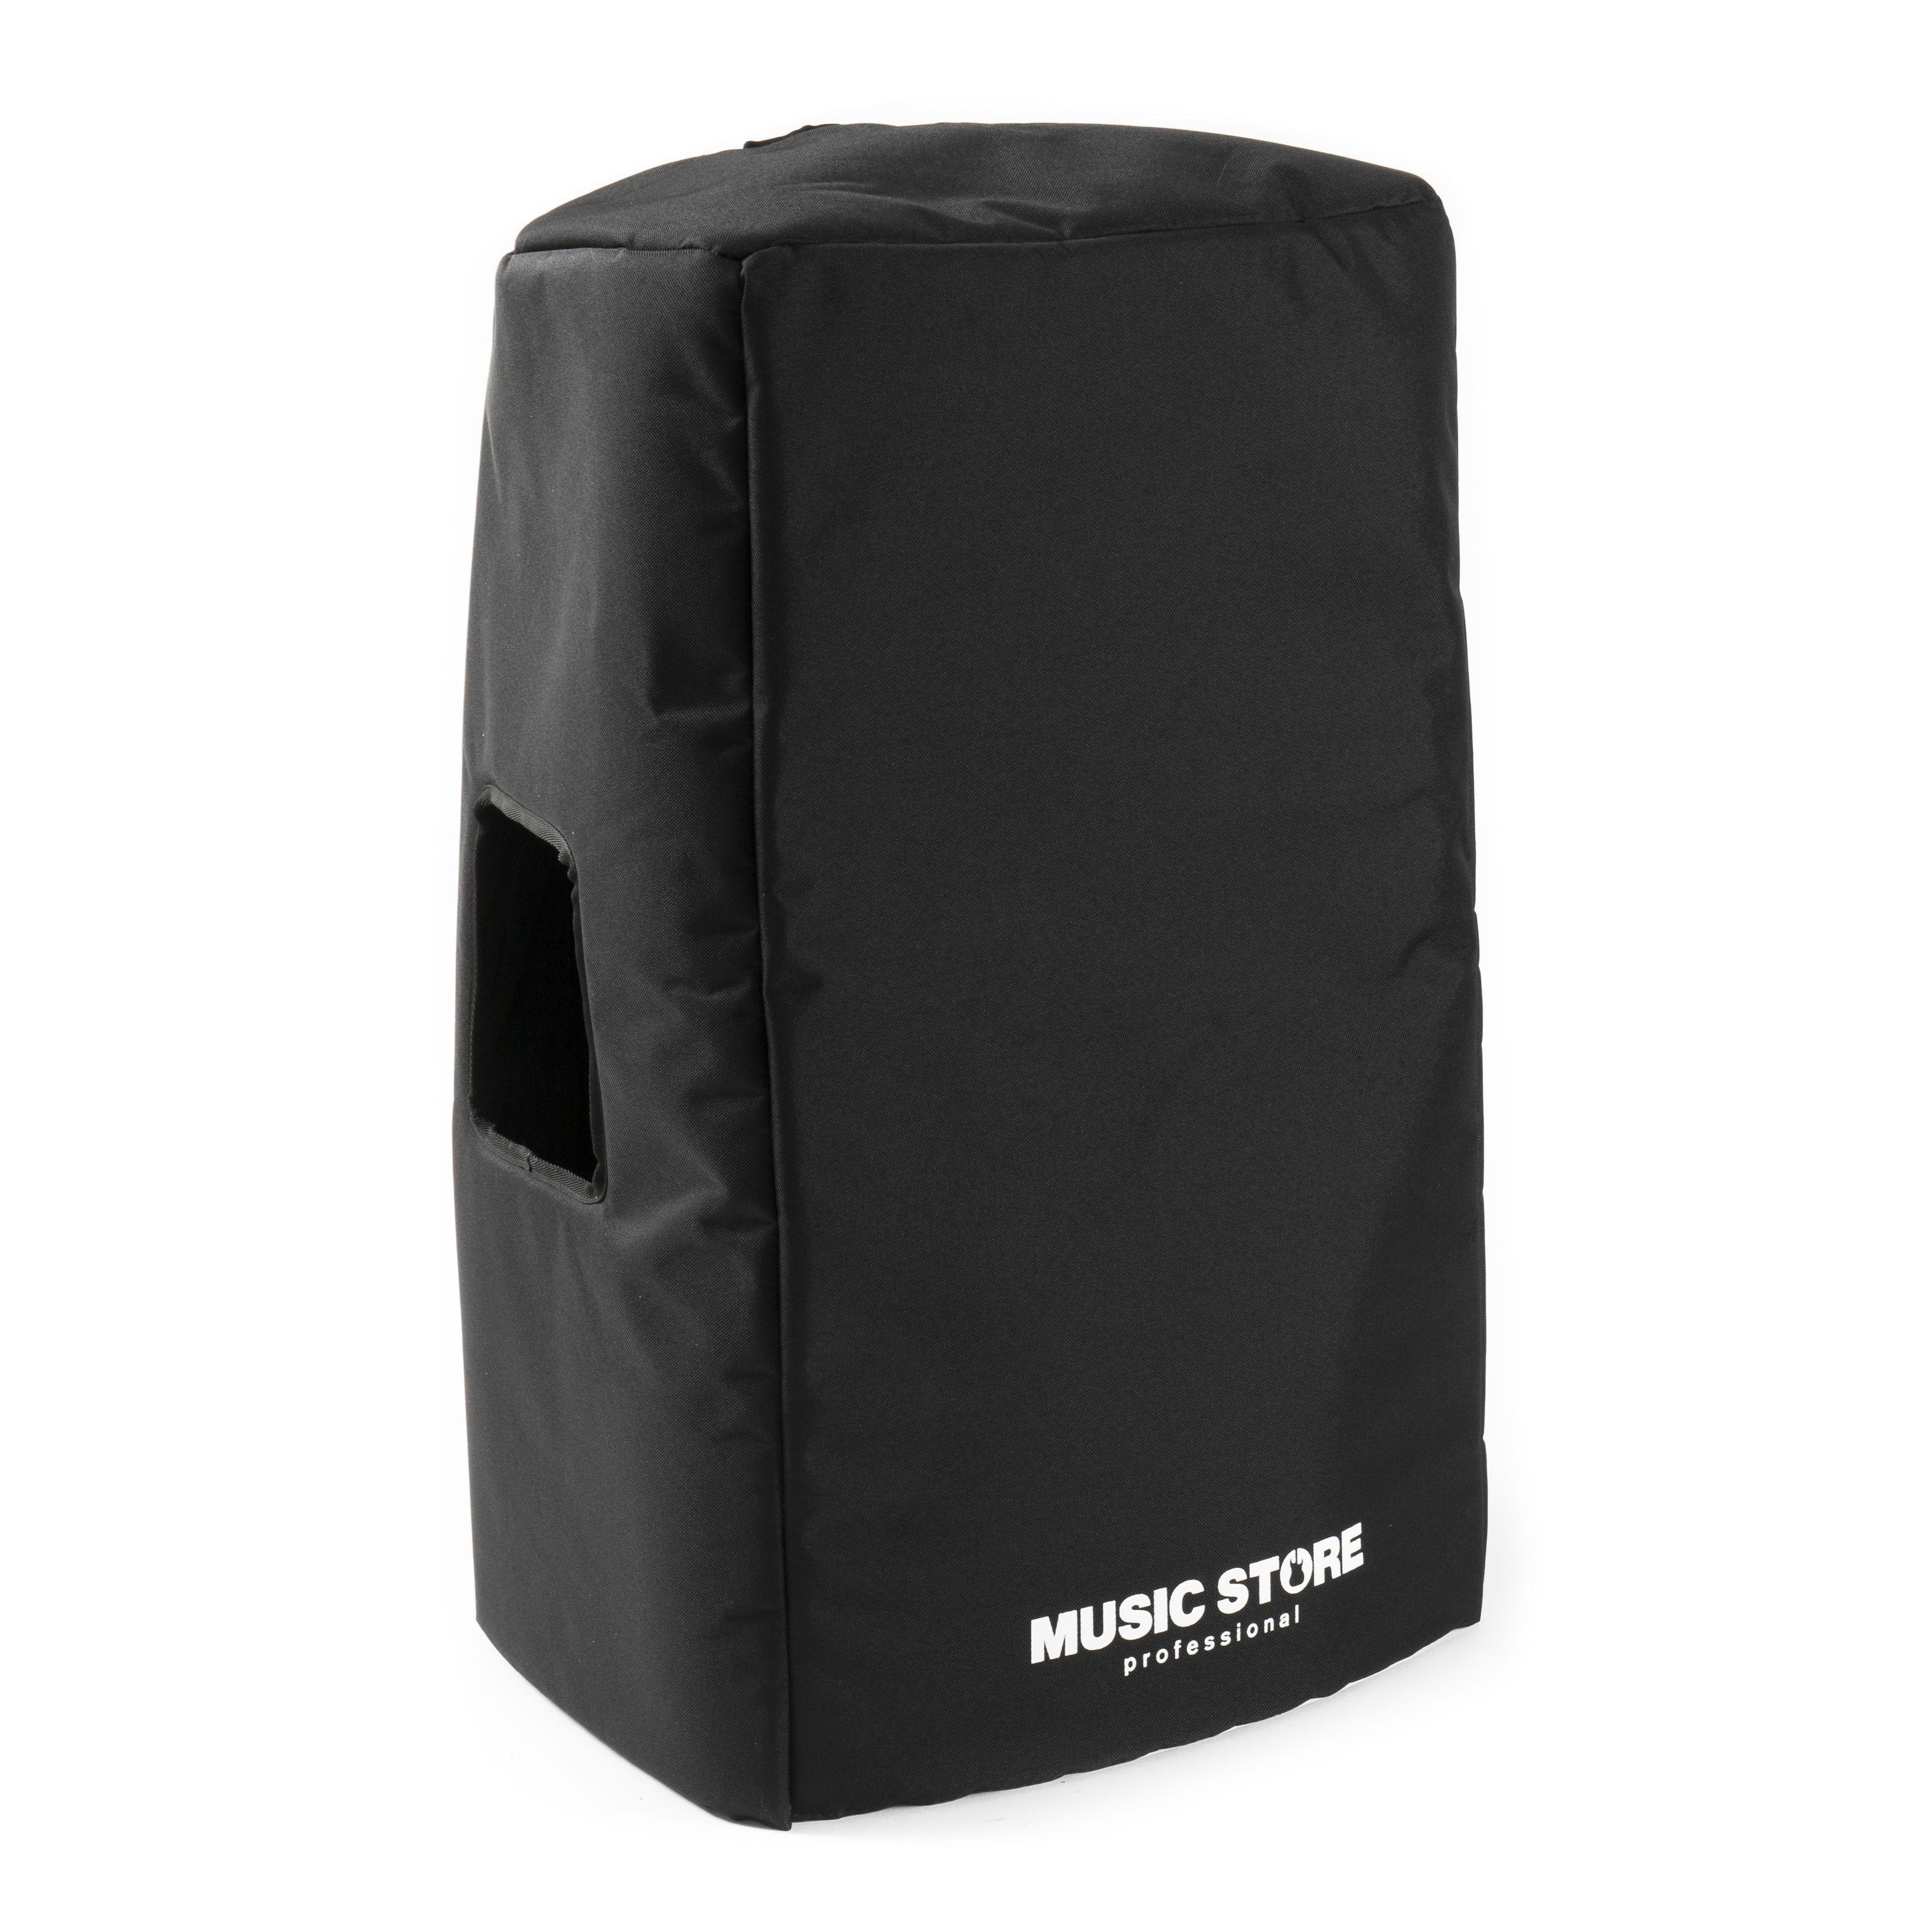 MUSIC STORE Padded Cover - JBL EON 615